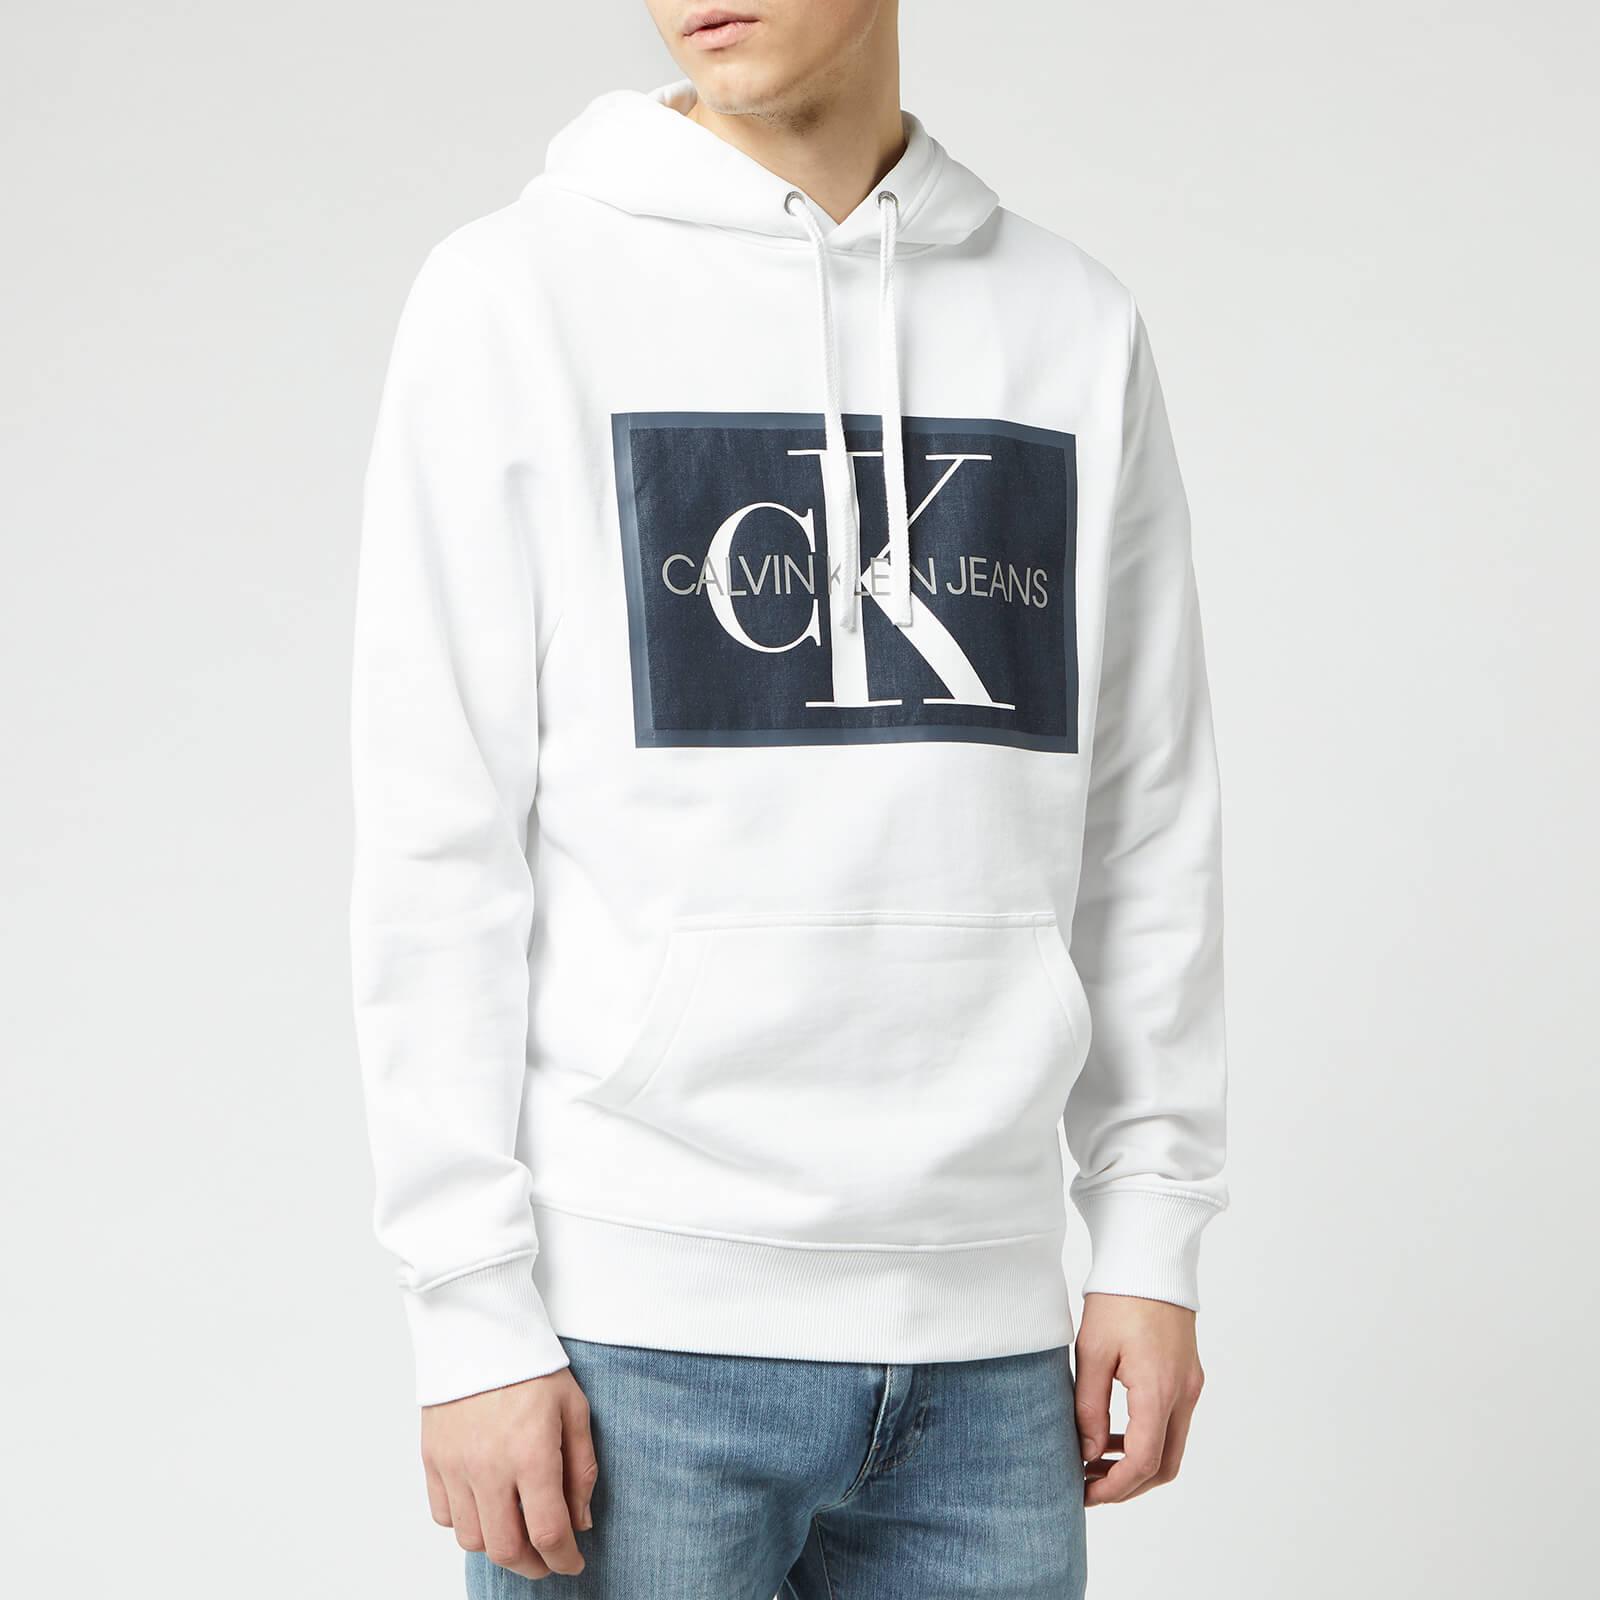 Calvin Klein Jeans Men's Monogram Patch Hoodie - Bright White - M - White